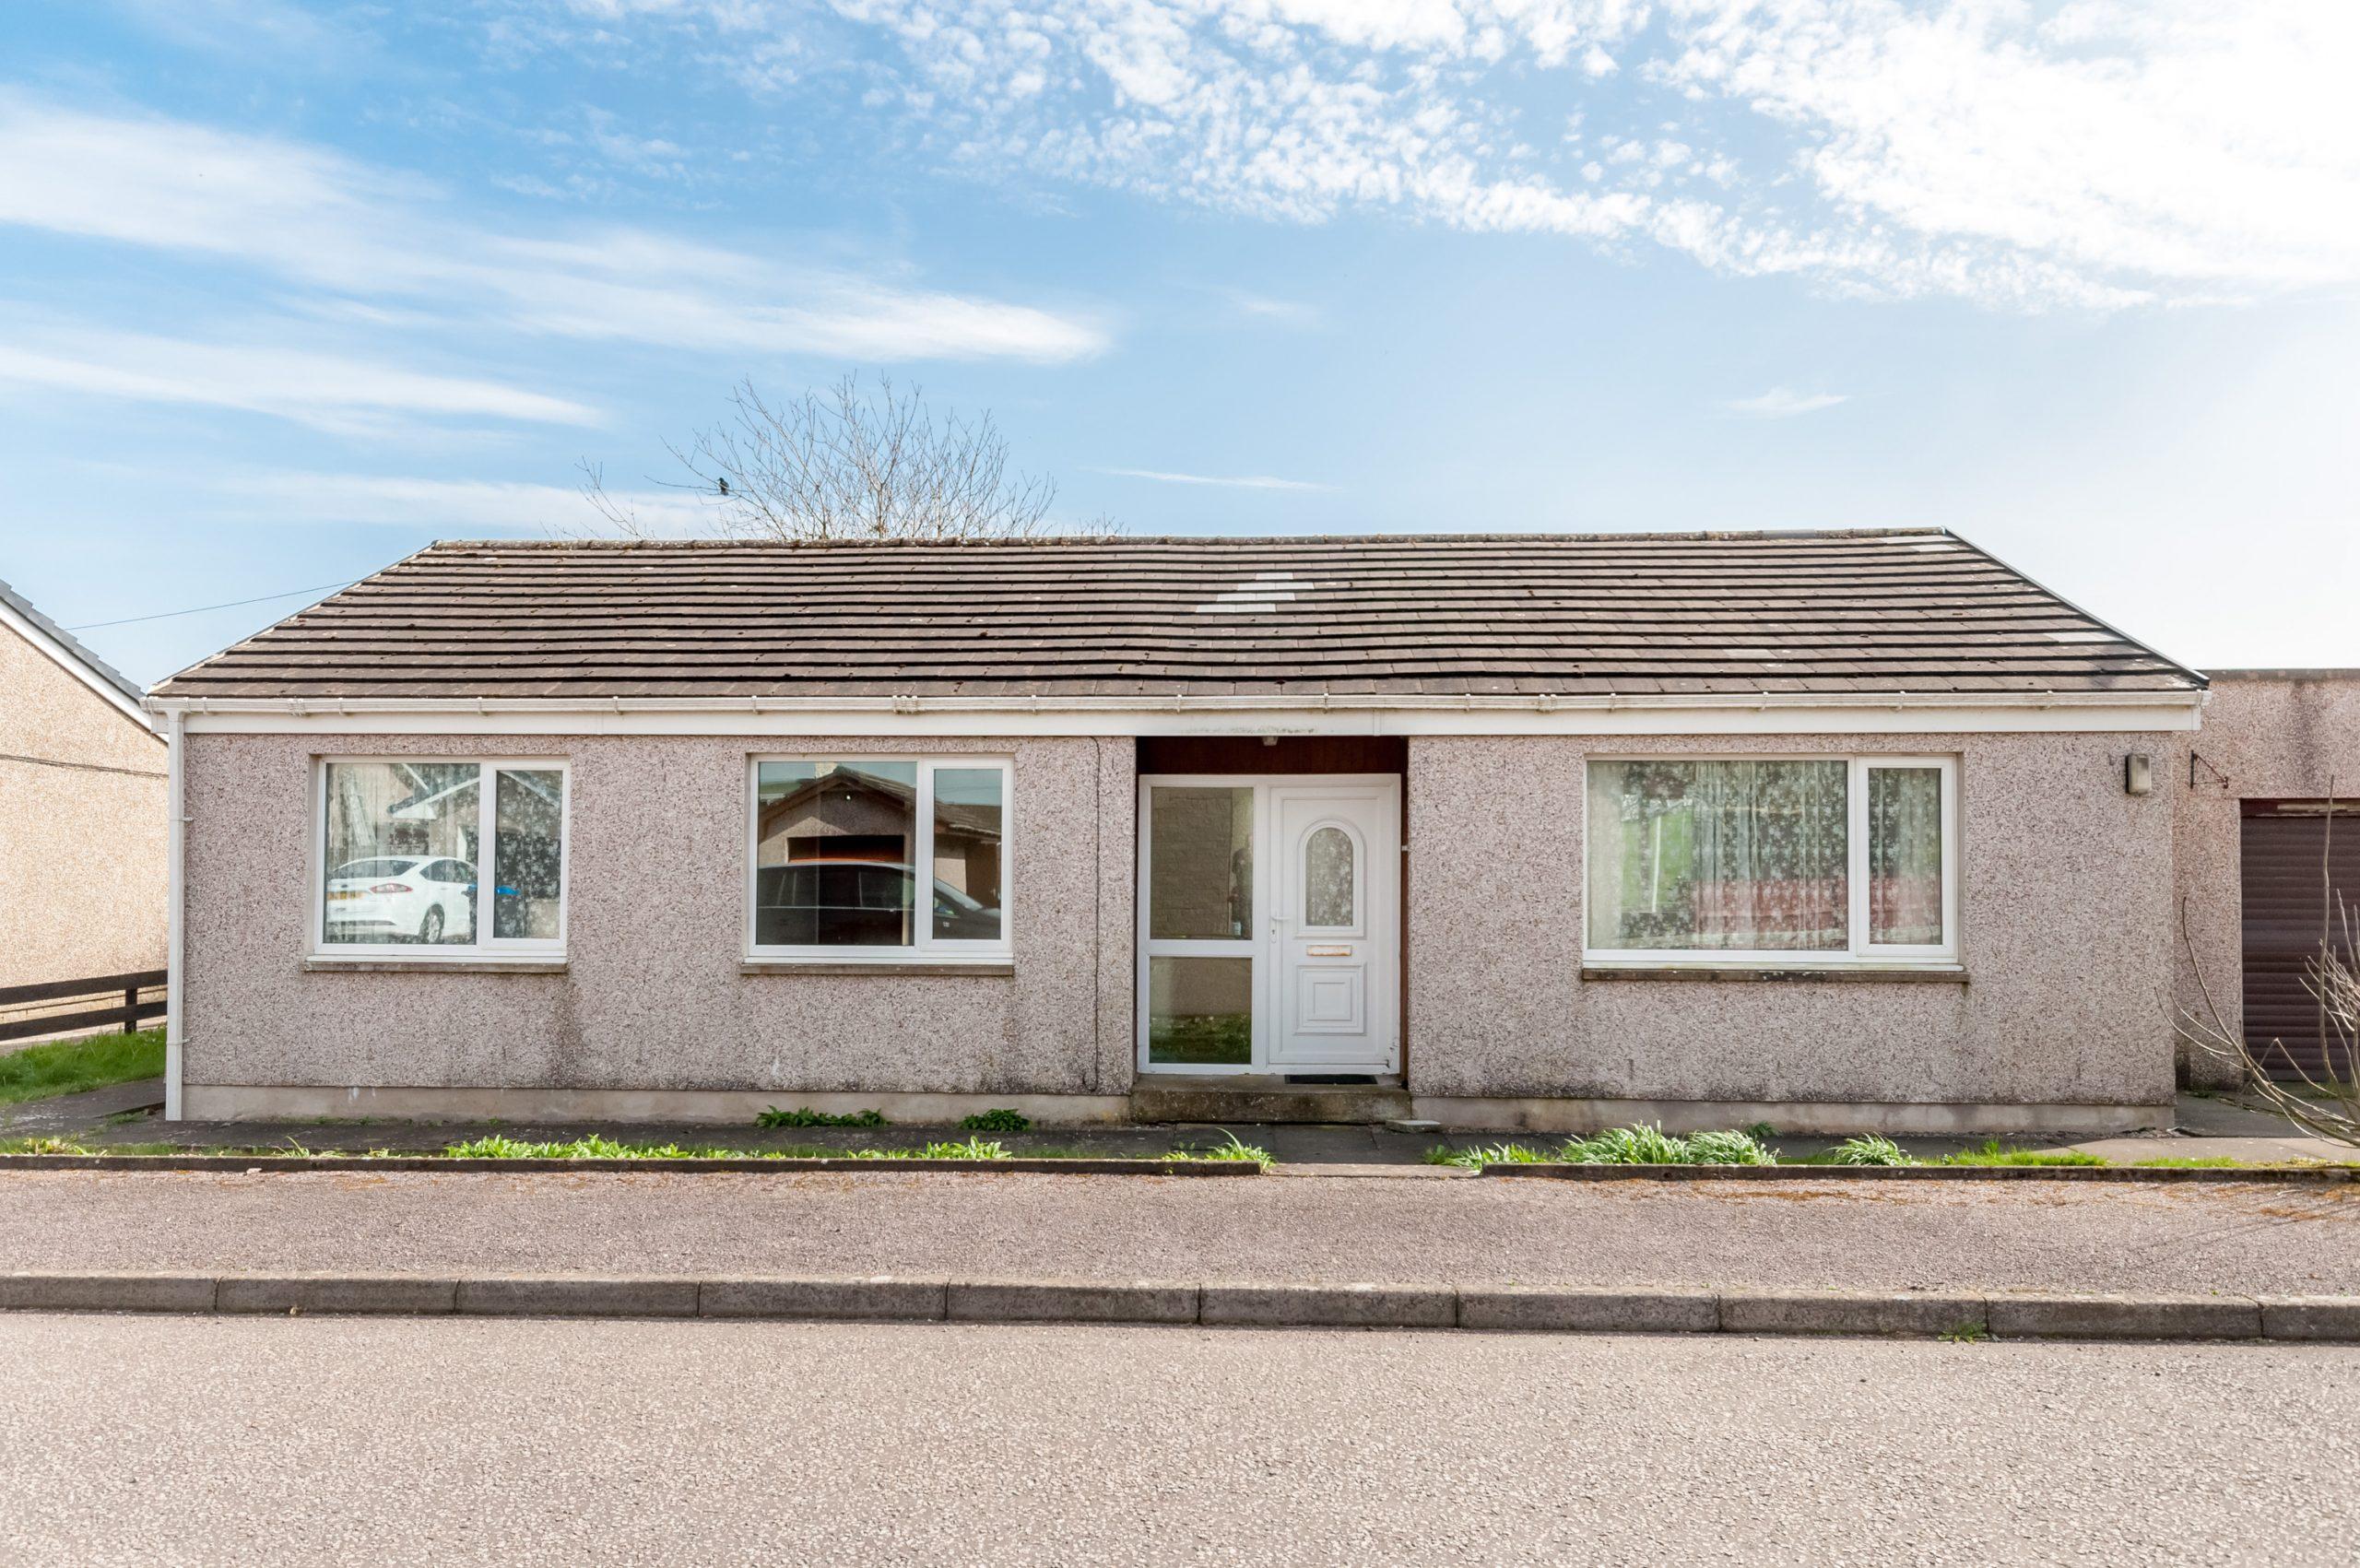 Southfield, 3 Curlew Close, Whauphill, DG8 9NN